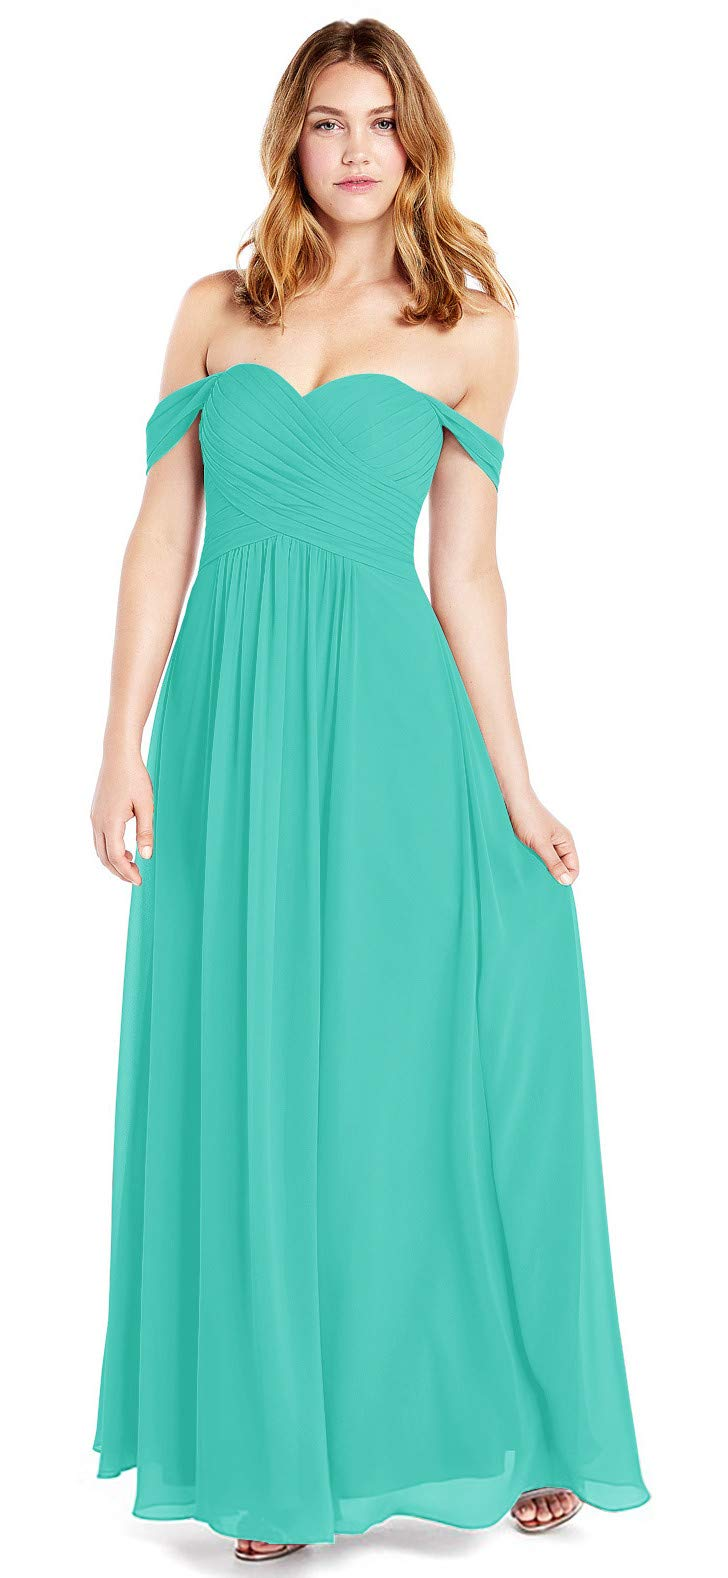 YUSHENGSM Women's A Line Ruched Chiffon Off The Shoulder Bridesmaid Dresses Long Formal Evening Maxi Dress